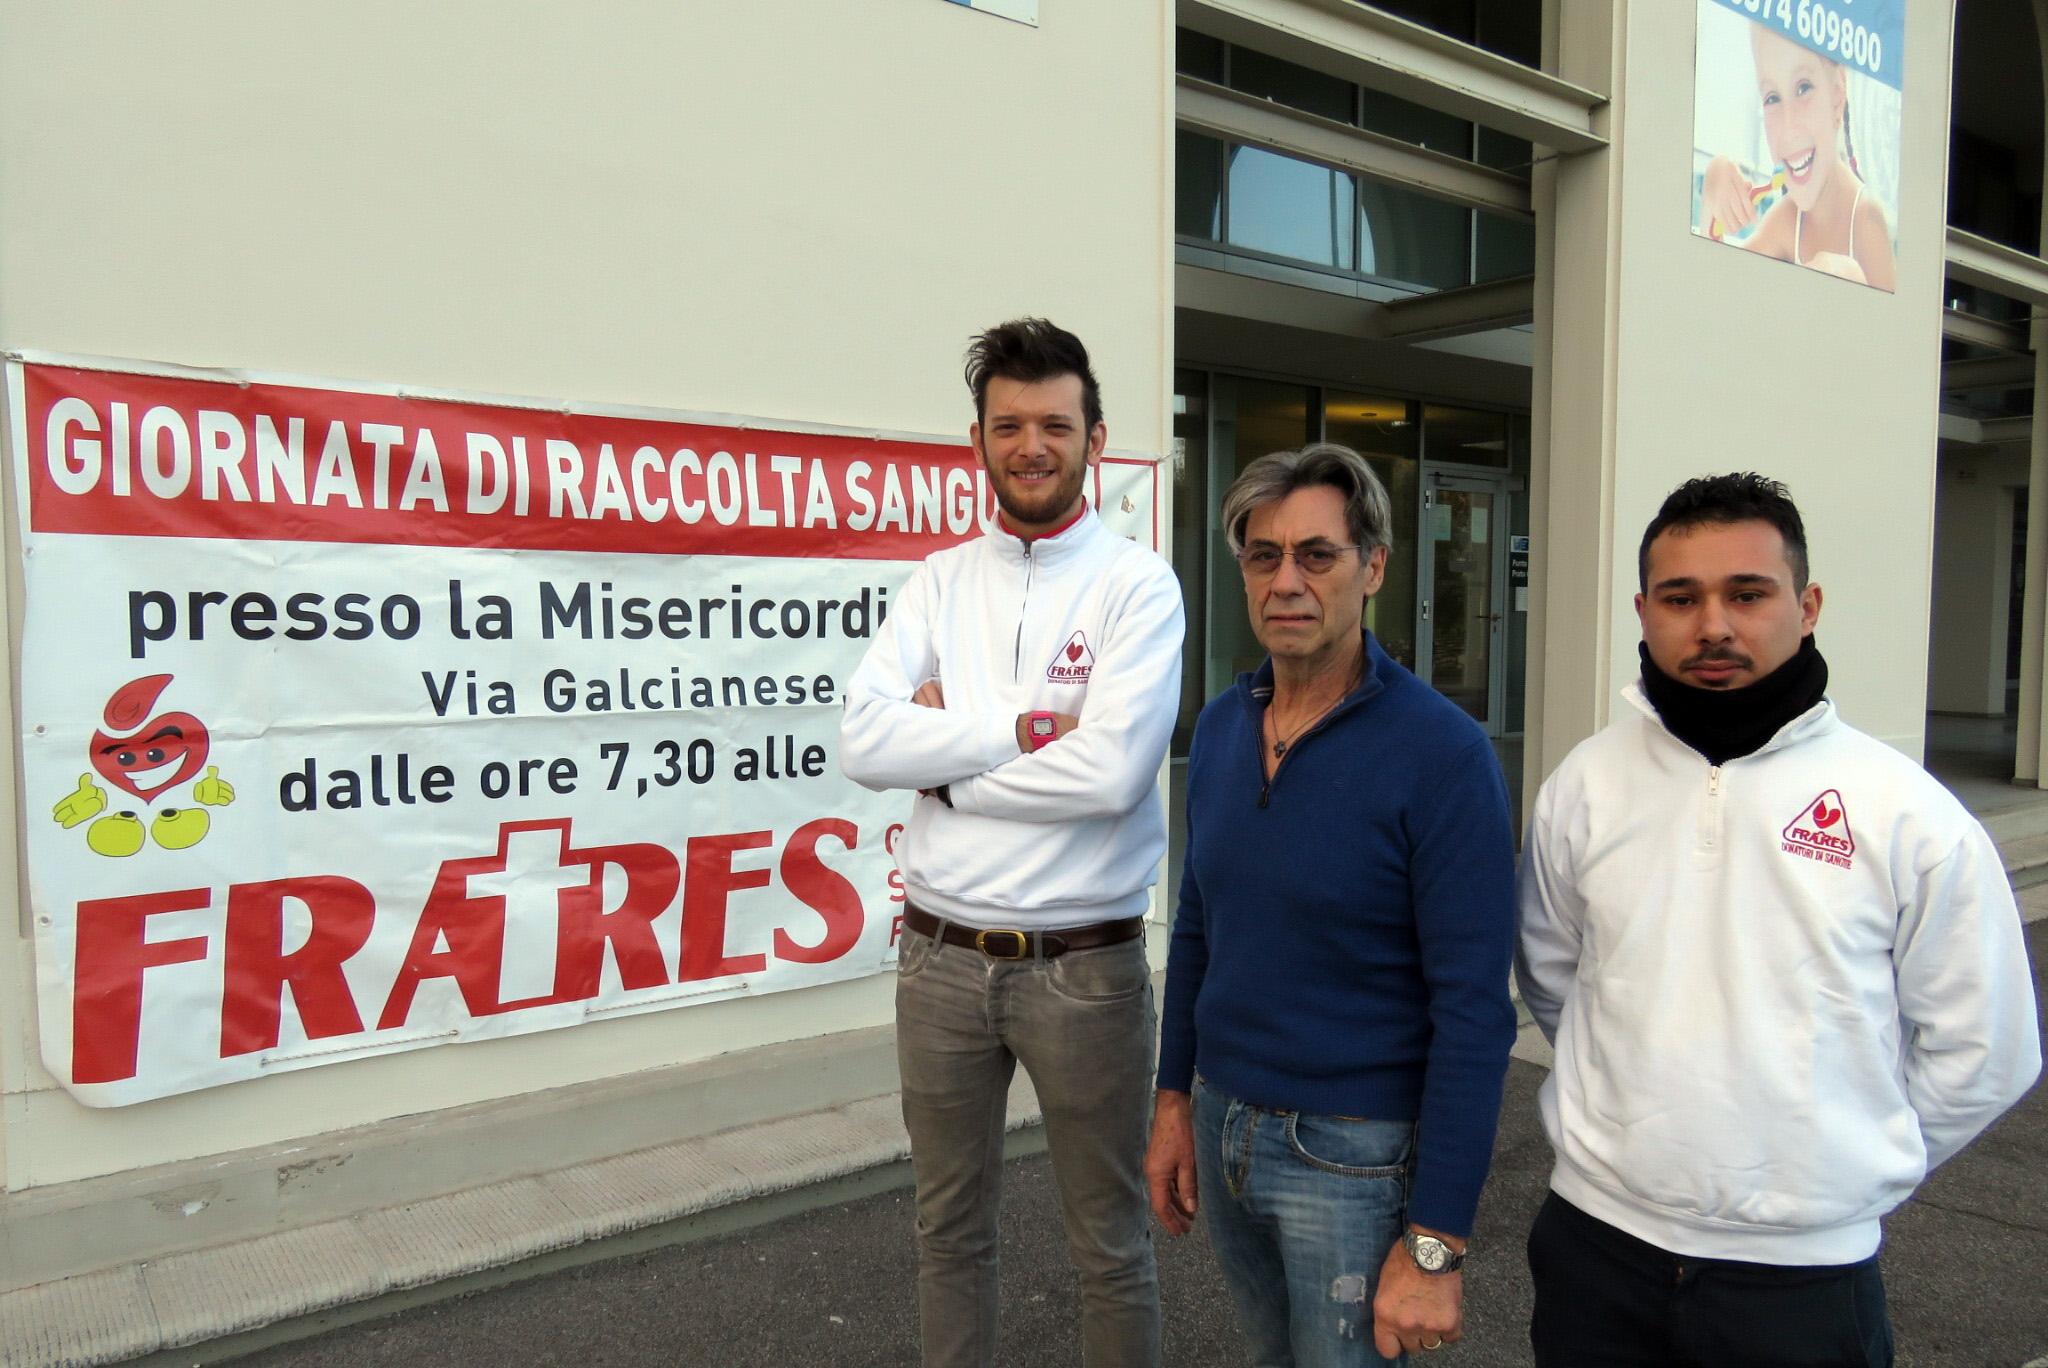 Gruppo Fratres Prato